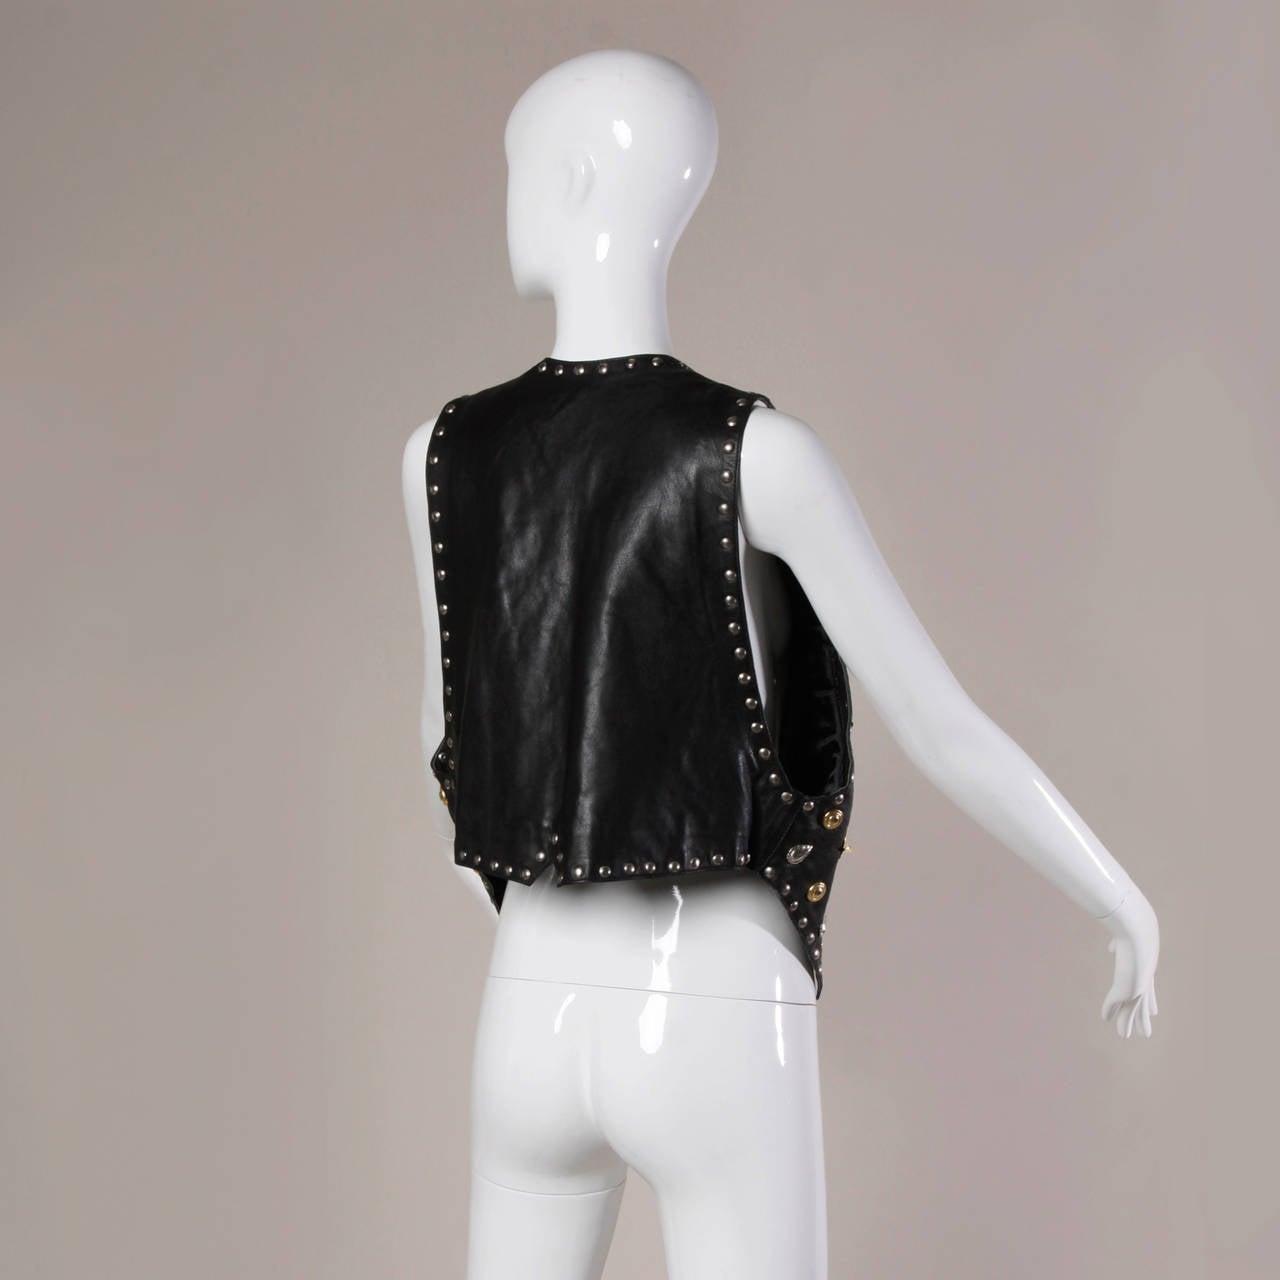 Vintage Leather Vest with Concho, Cowboy Boots, + Horse Studs 6